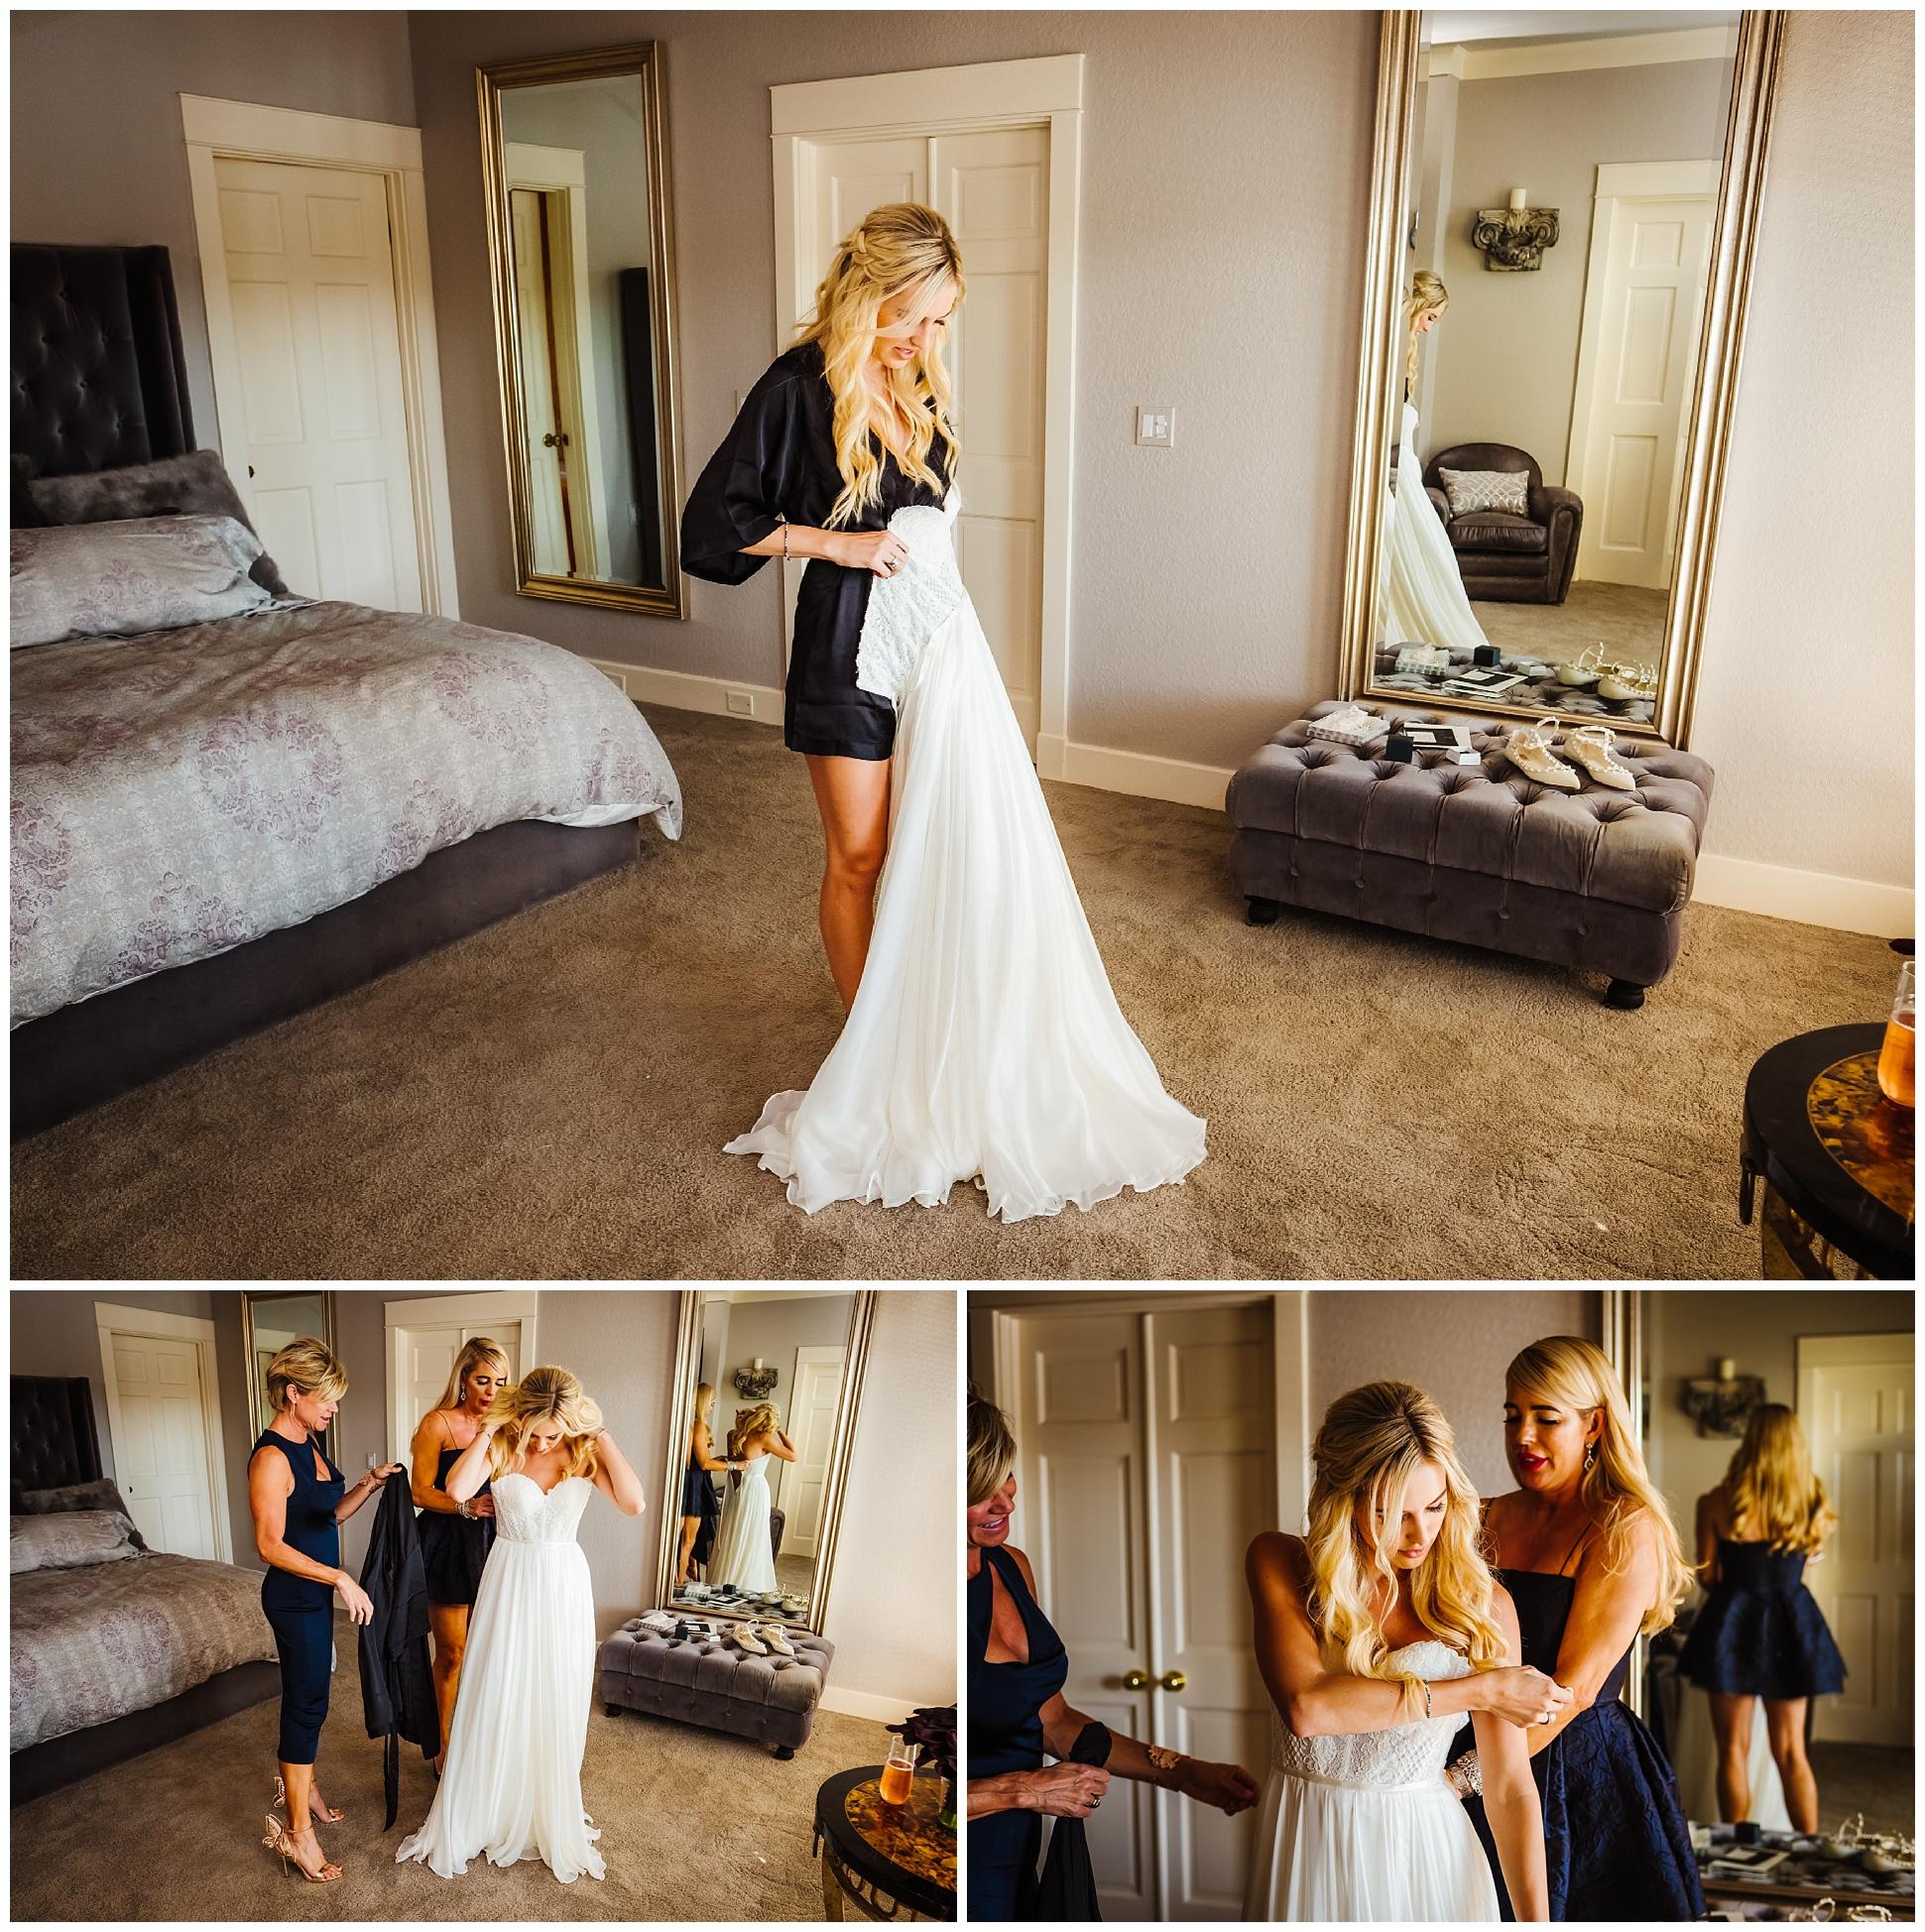 st-pete-wedding-photographer-backyard-luxury-snell-isle-vinoy_0008.jpg